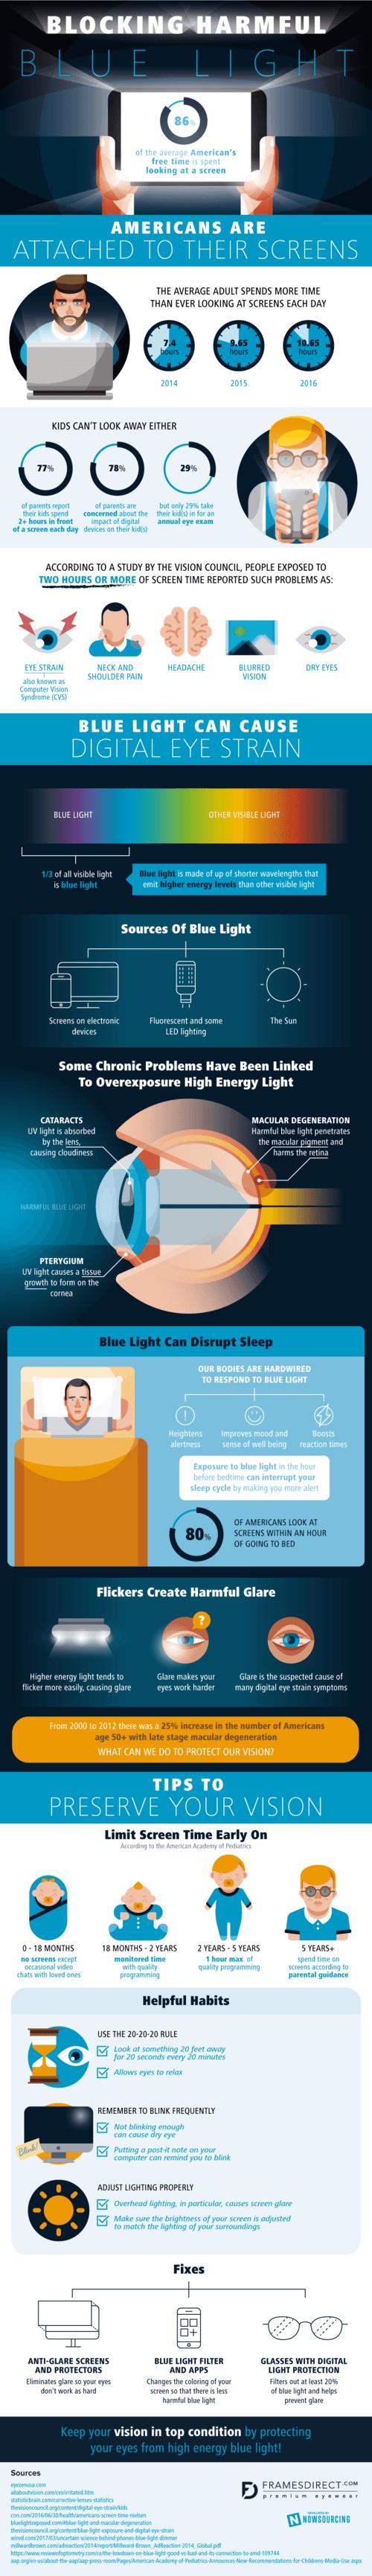 Blocking Harmful Blue Light via Brian Wallace